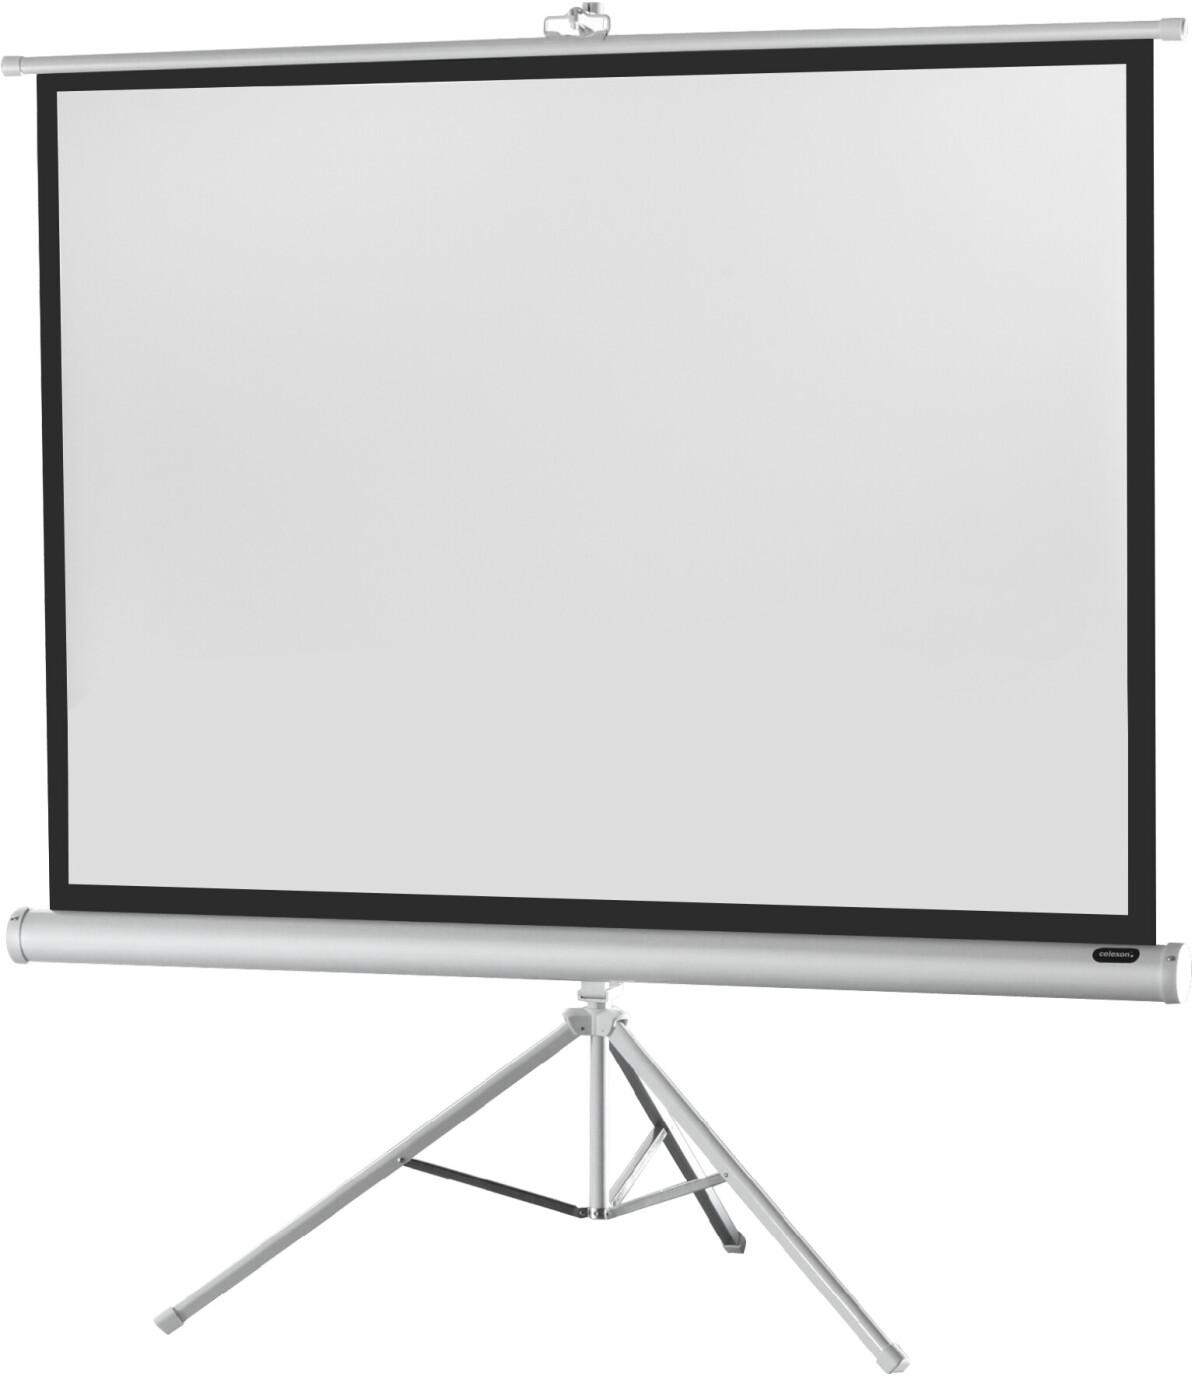 celexon Stativleinwand Economy 133 x 100 cm - White Edition